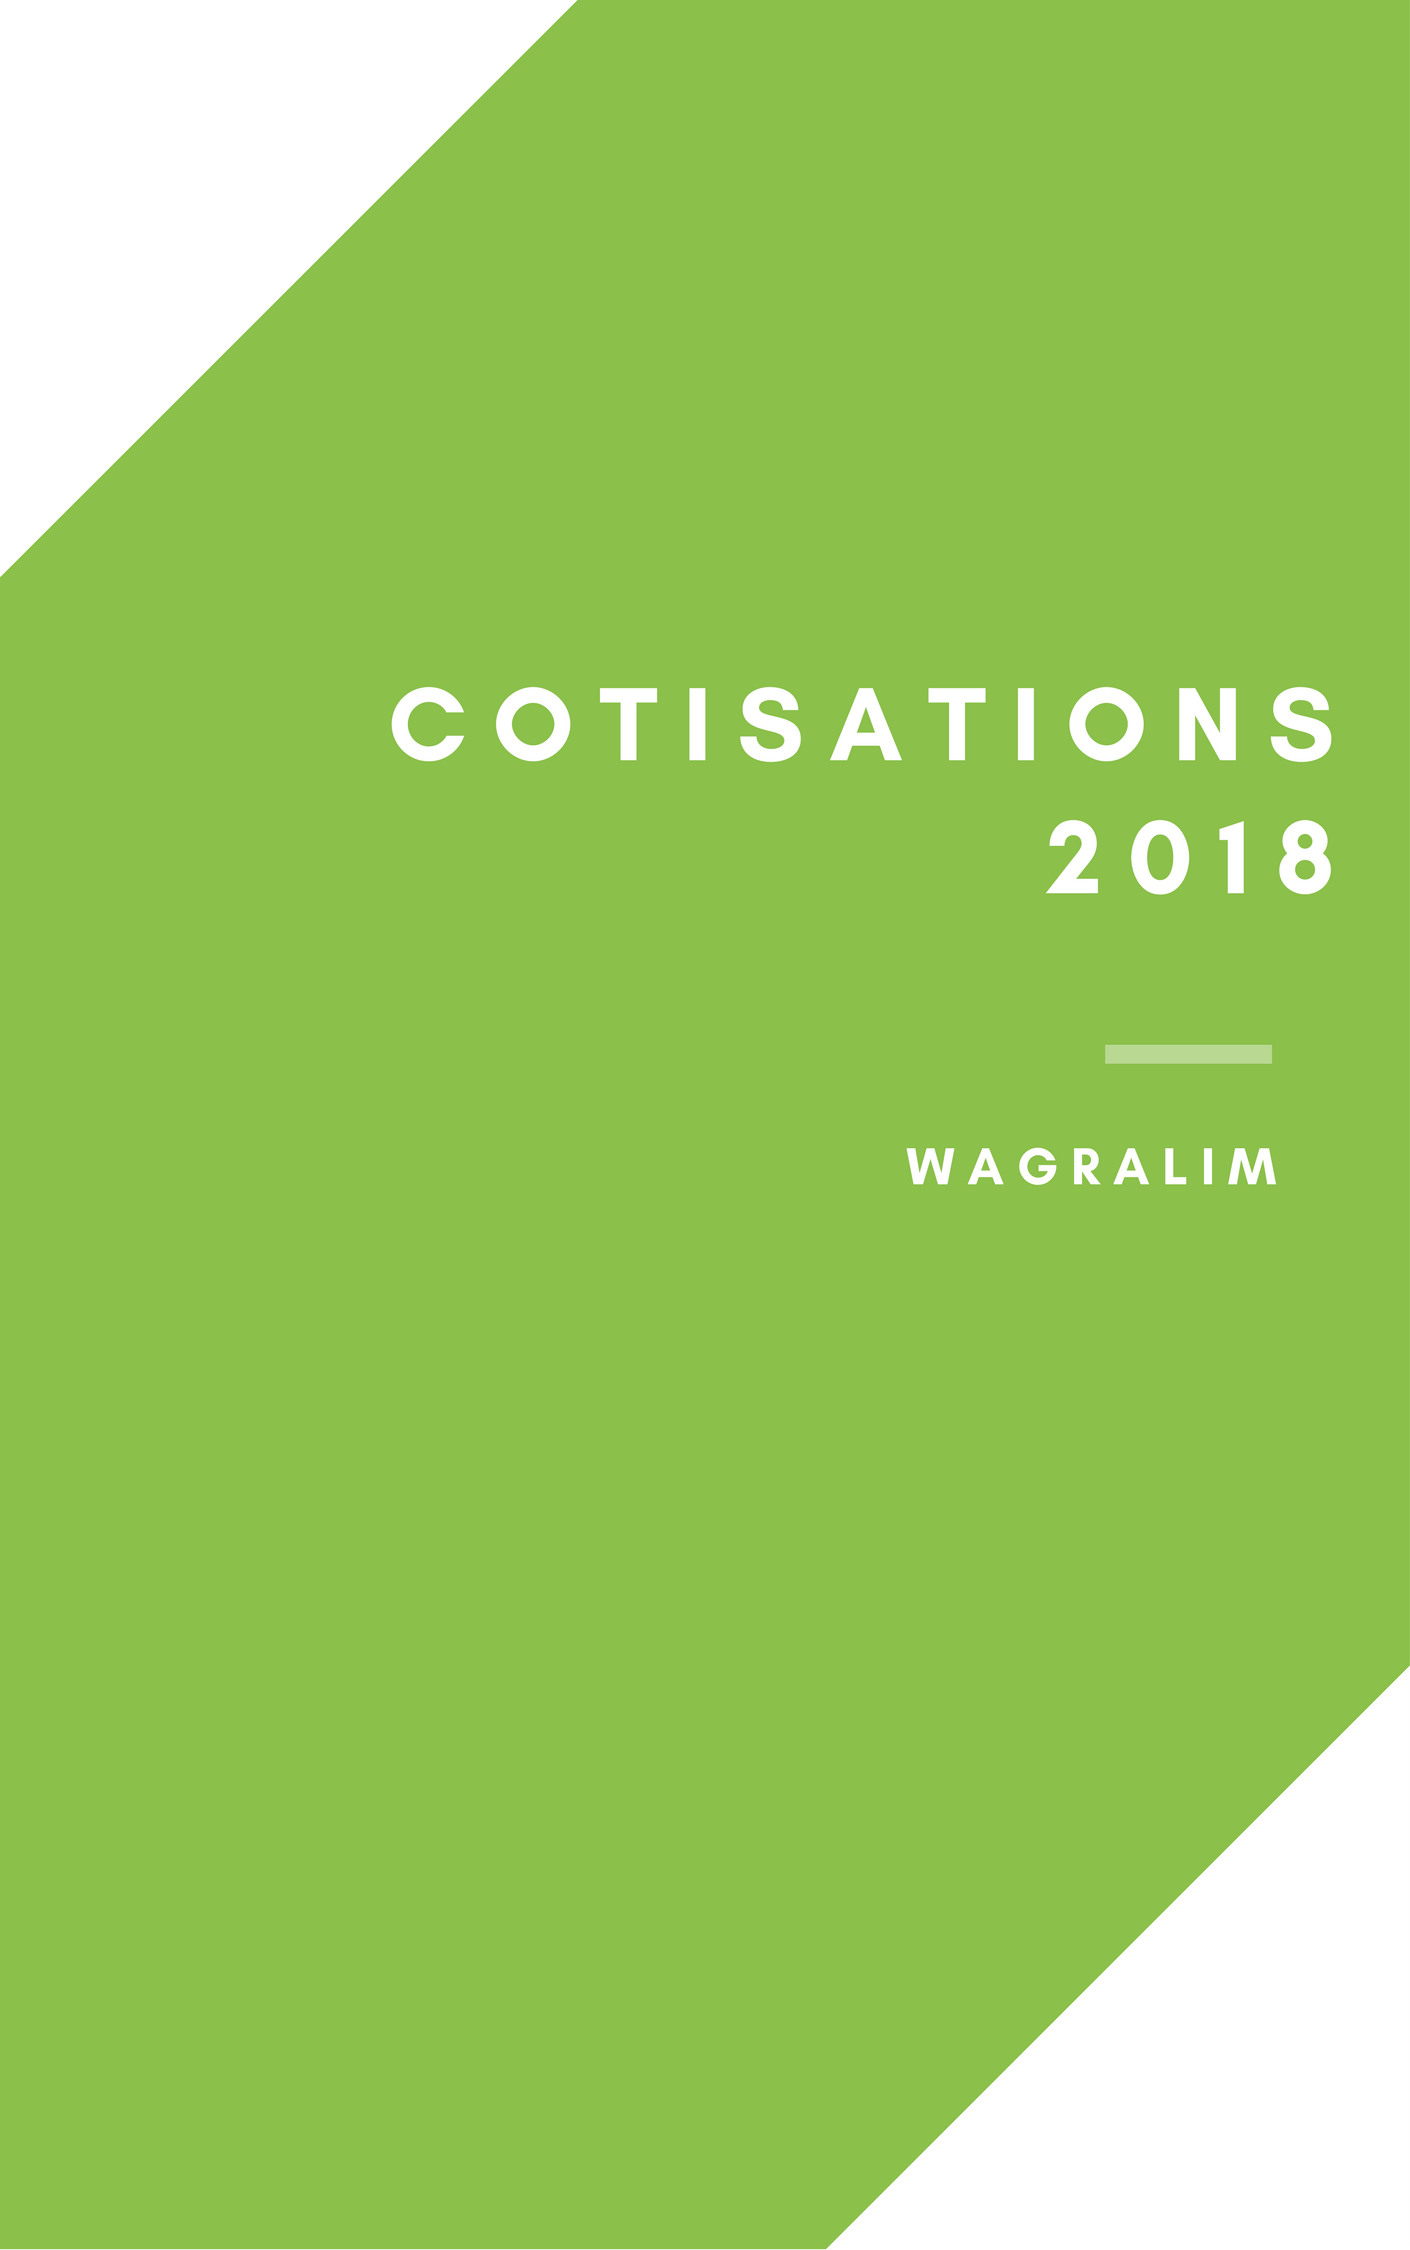 Grille des cotisations Wagralim 2018